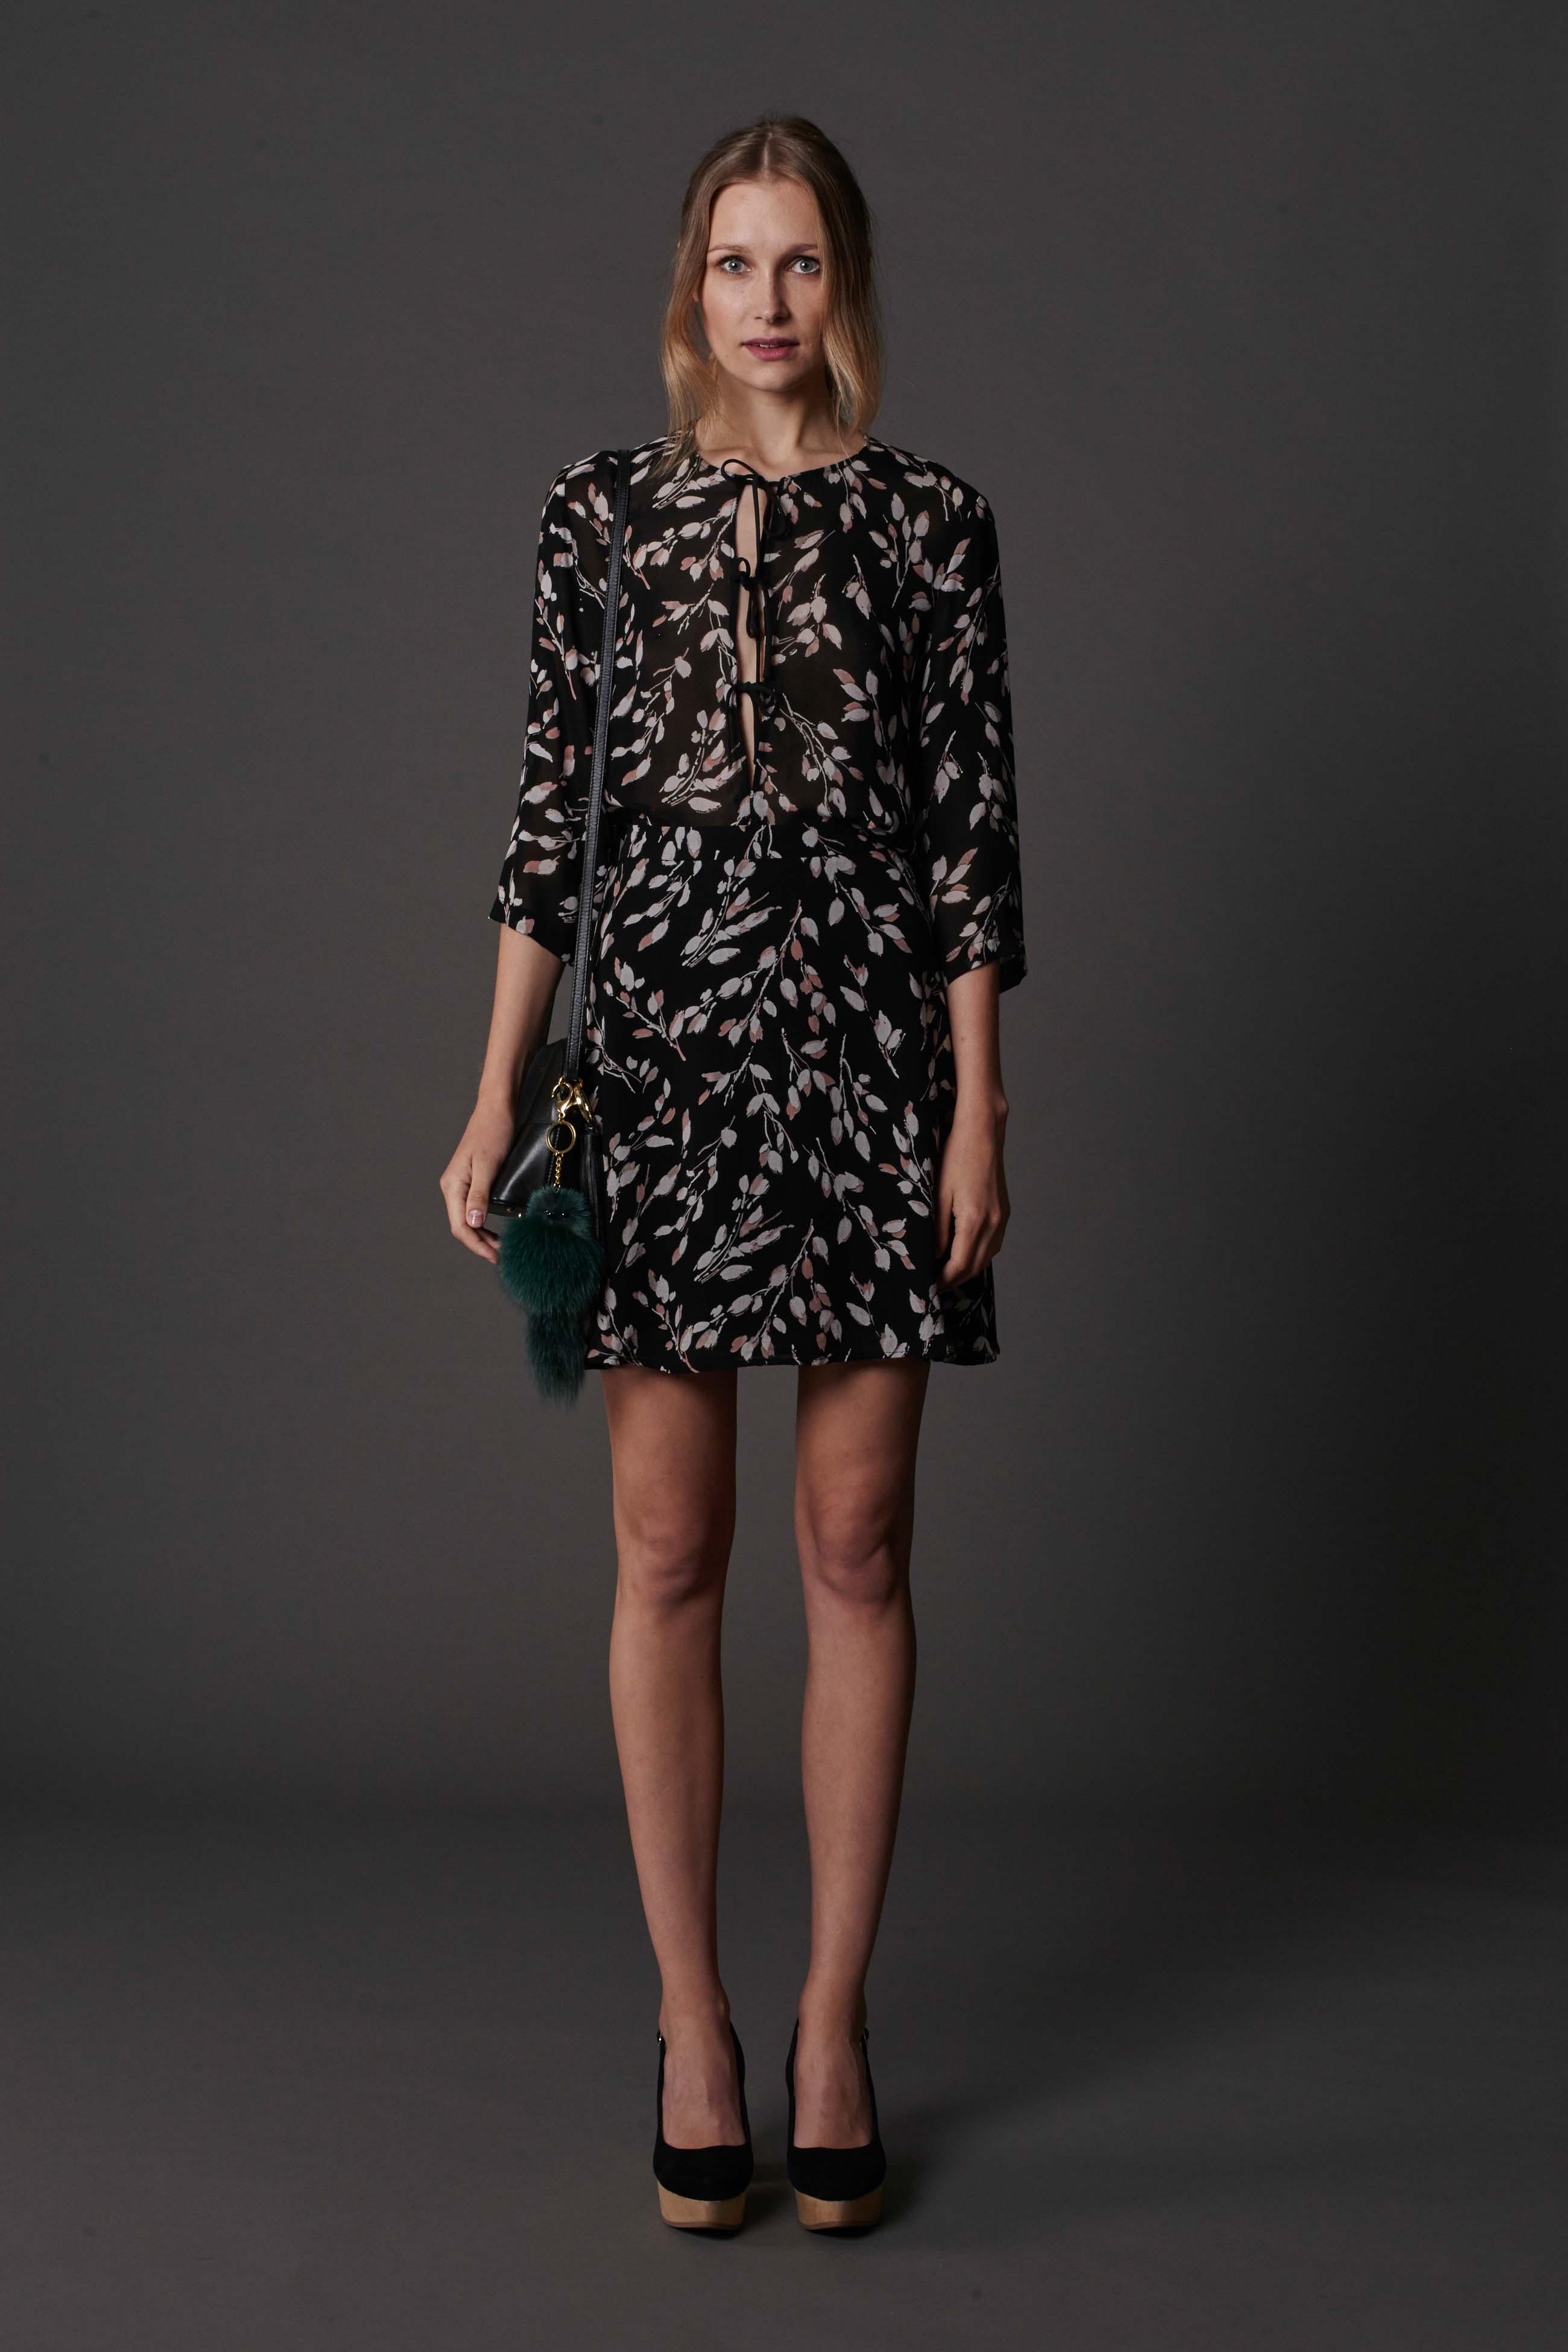 RUBY Inez Blouse, Inez Miniskirt, Lila Shoulder Bag & Halo Heel